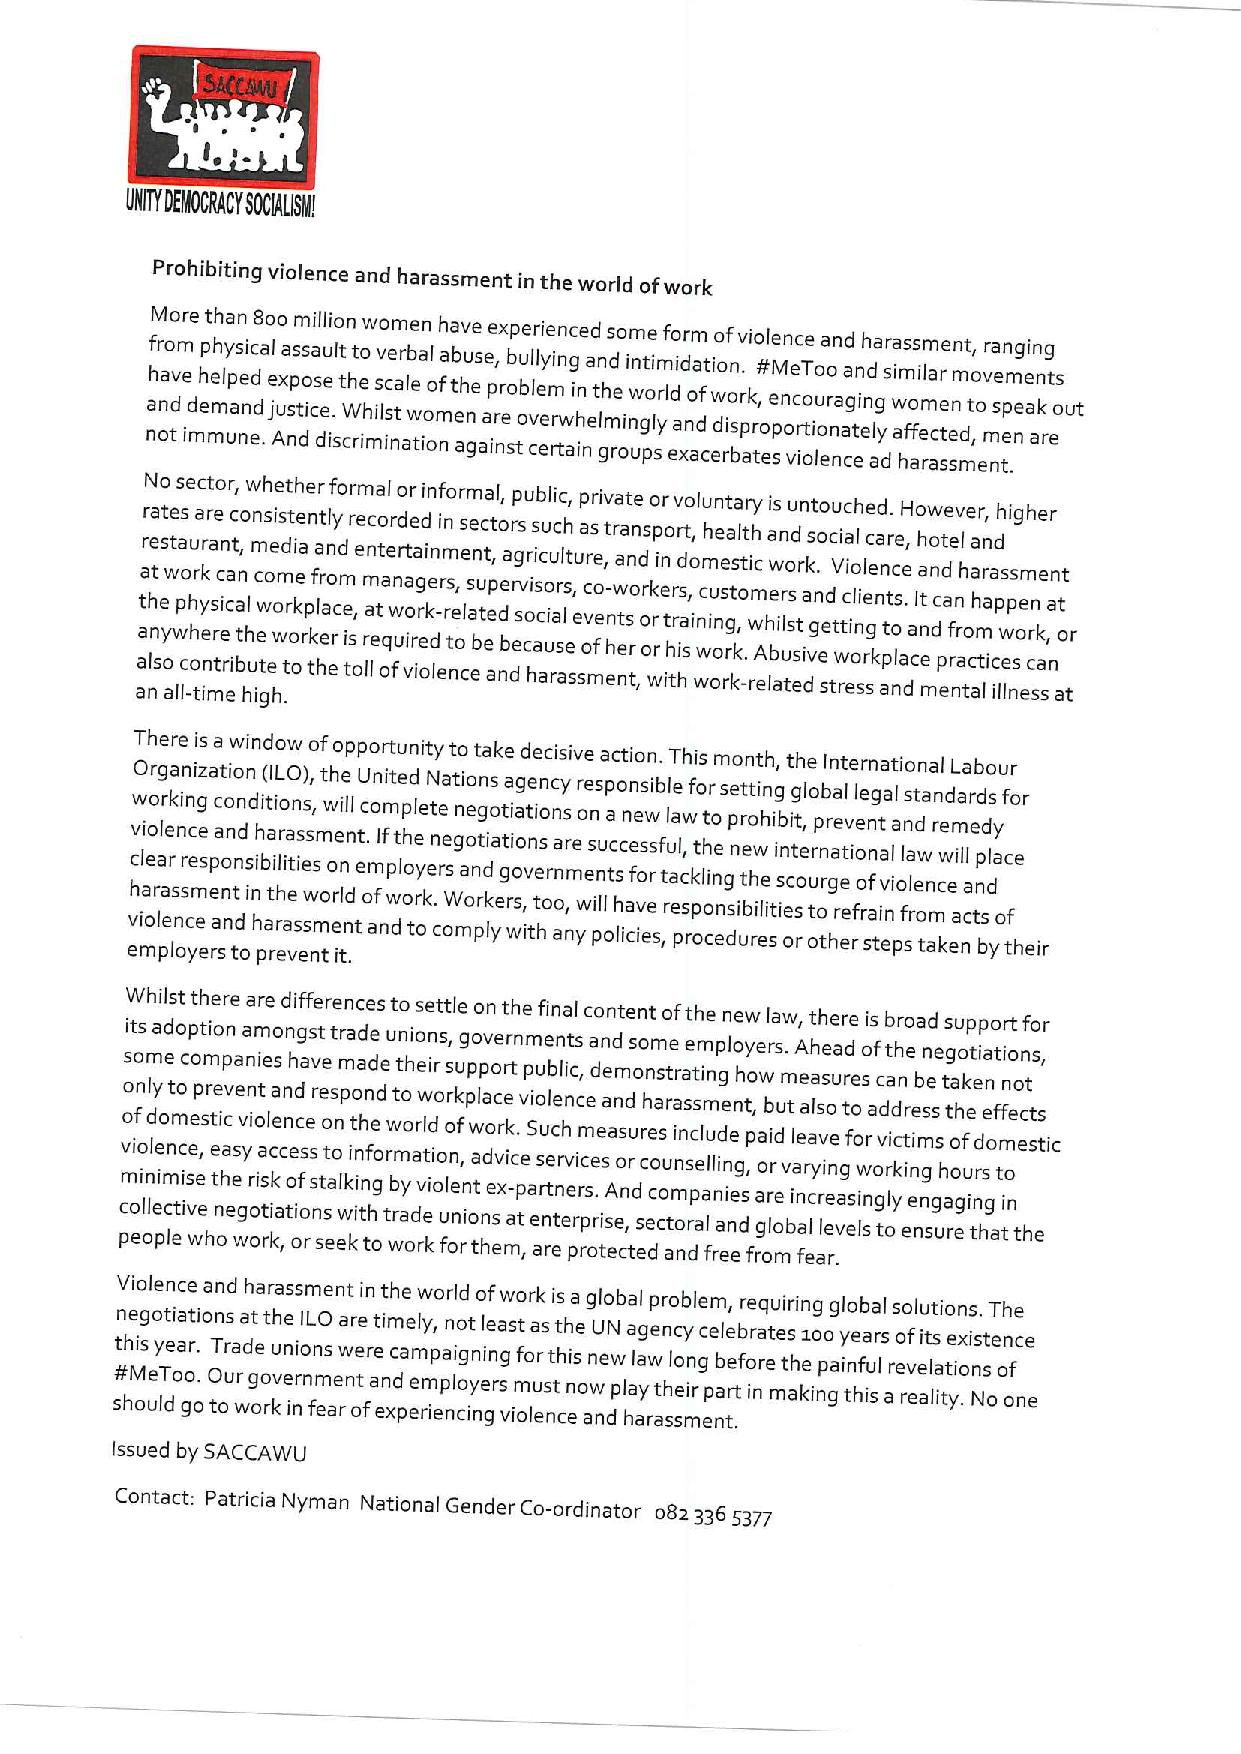 Saccawu statement